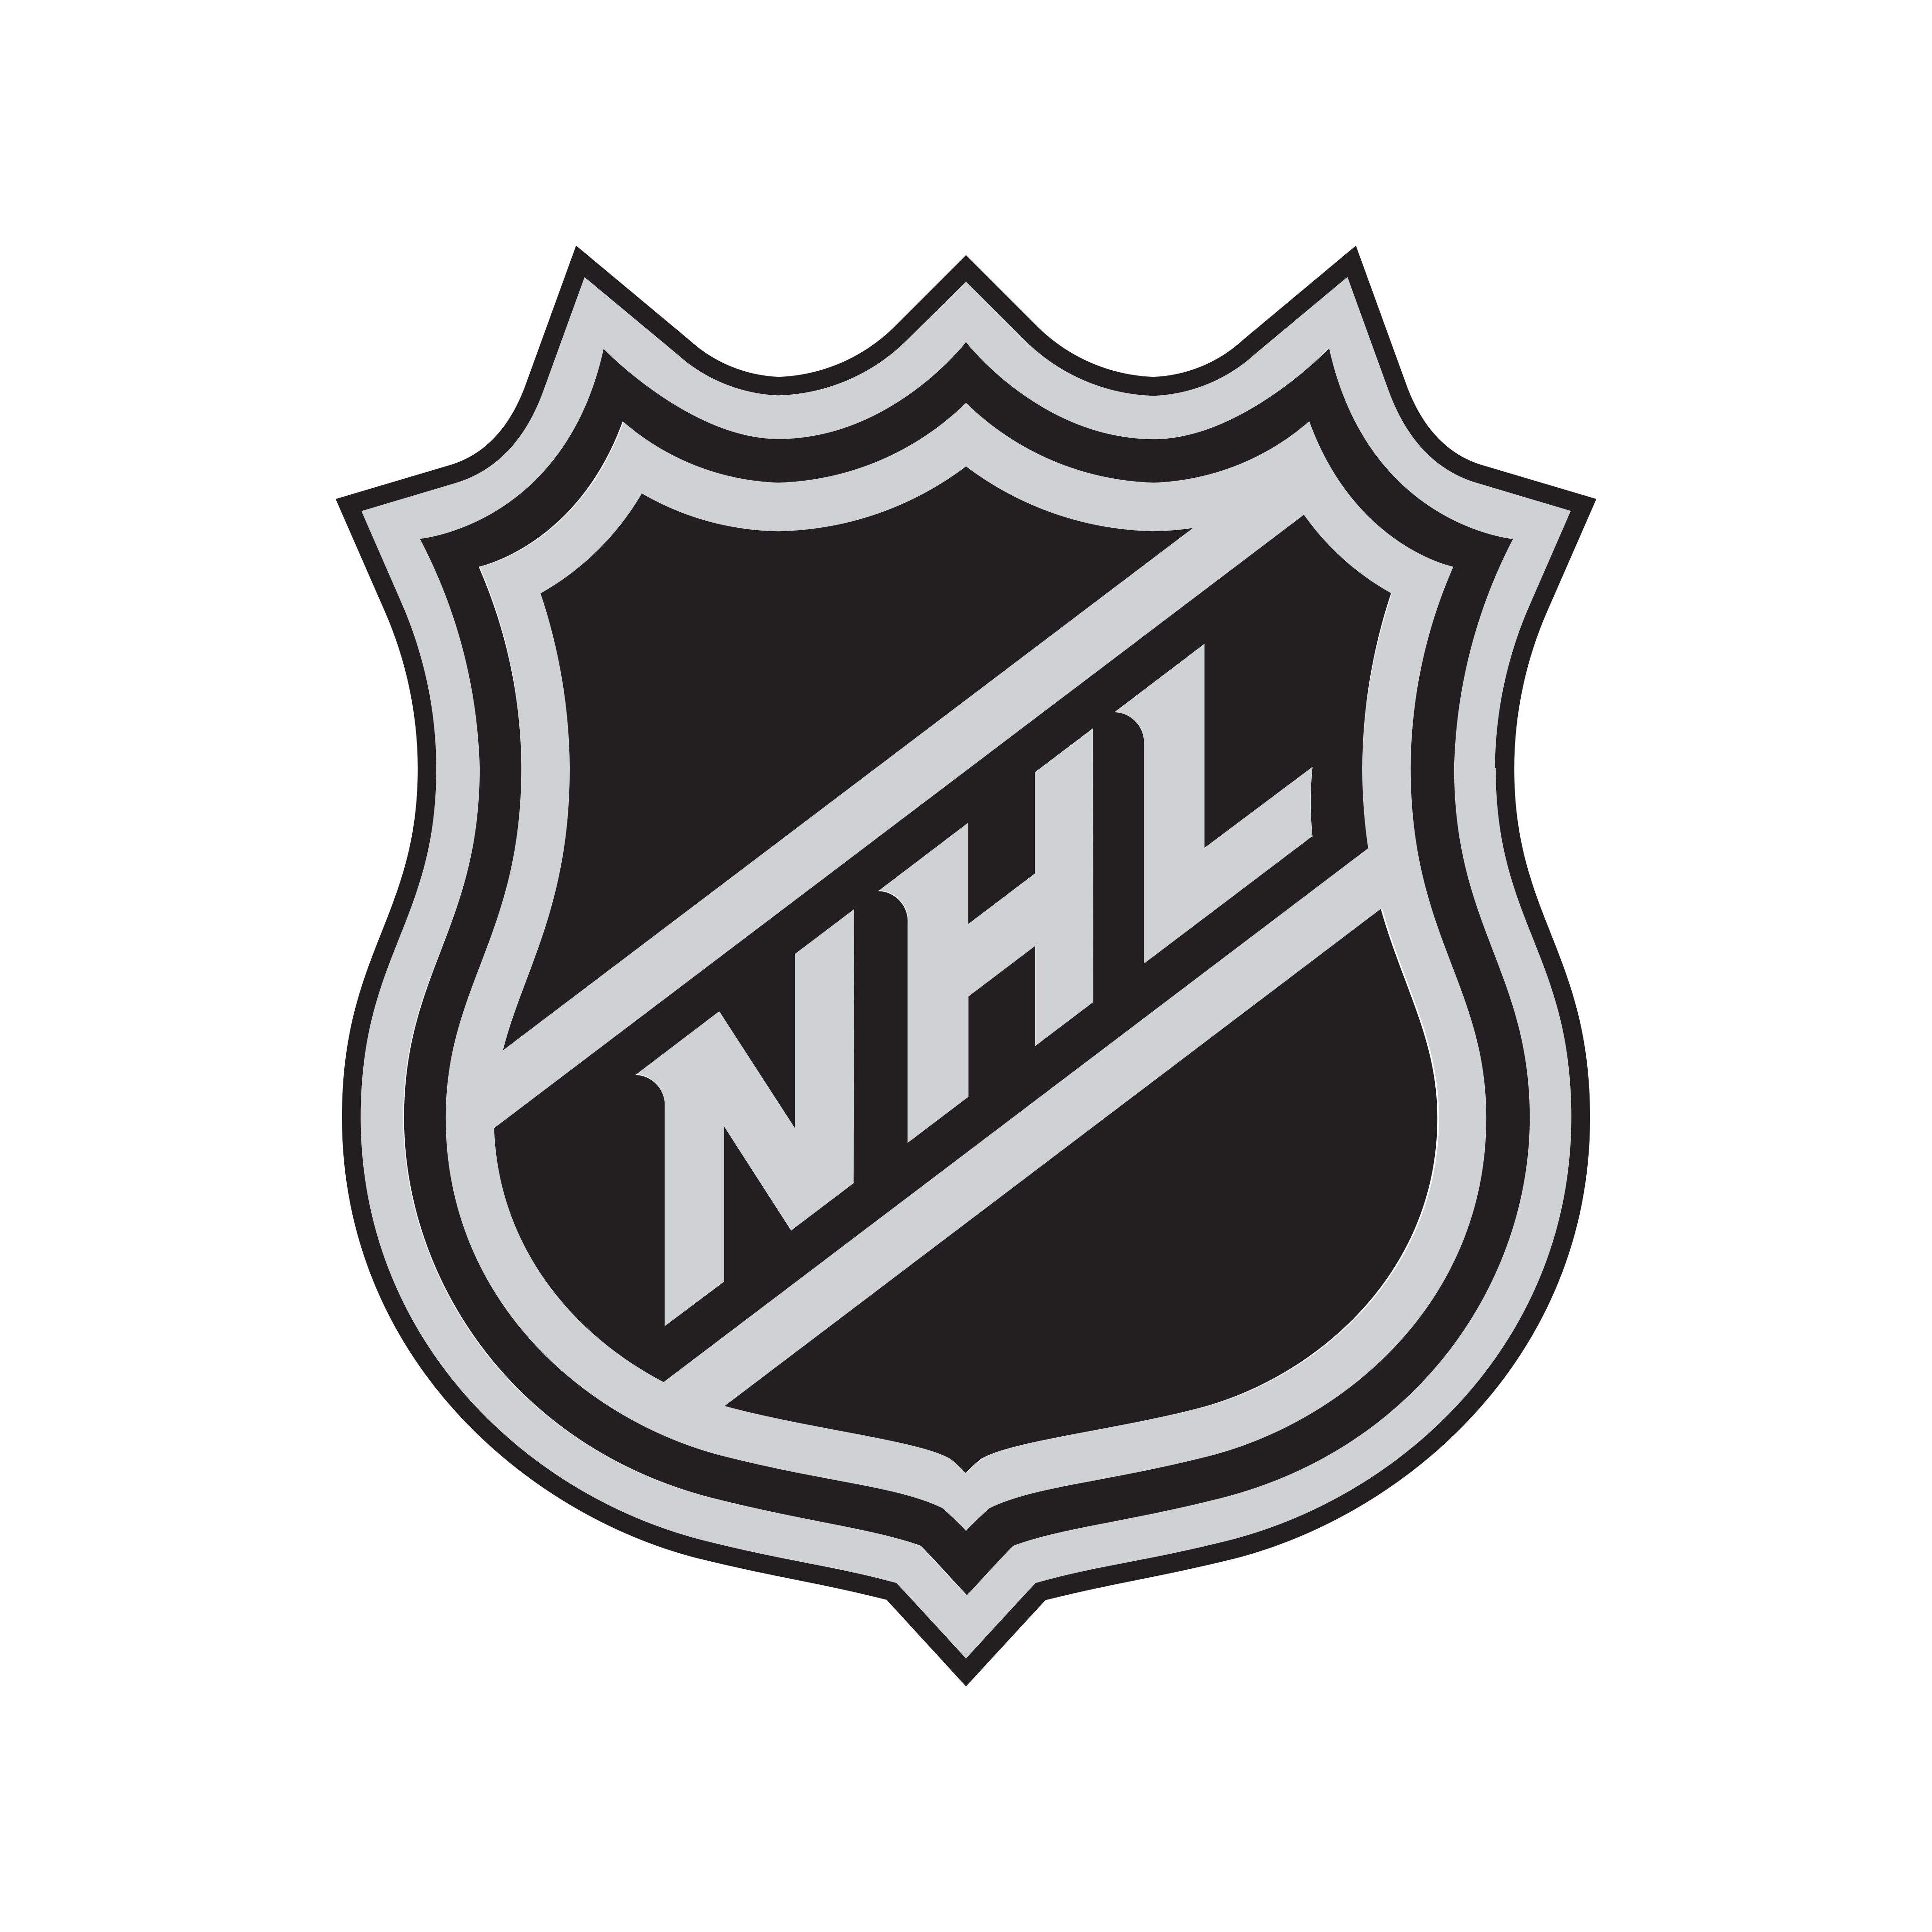 nhl logo 0 - NHL Logo - National Hockey League Logo